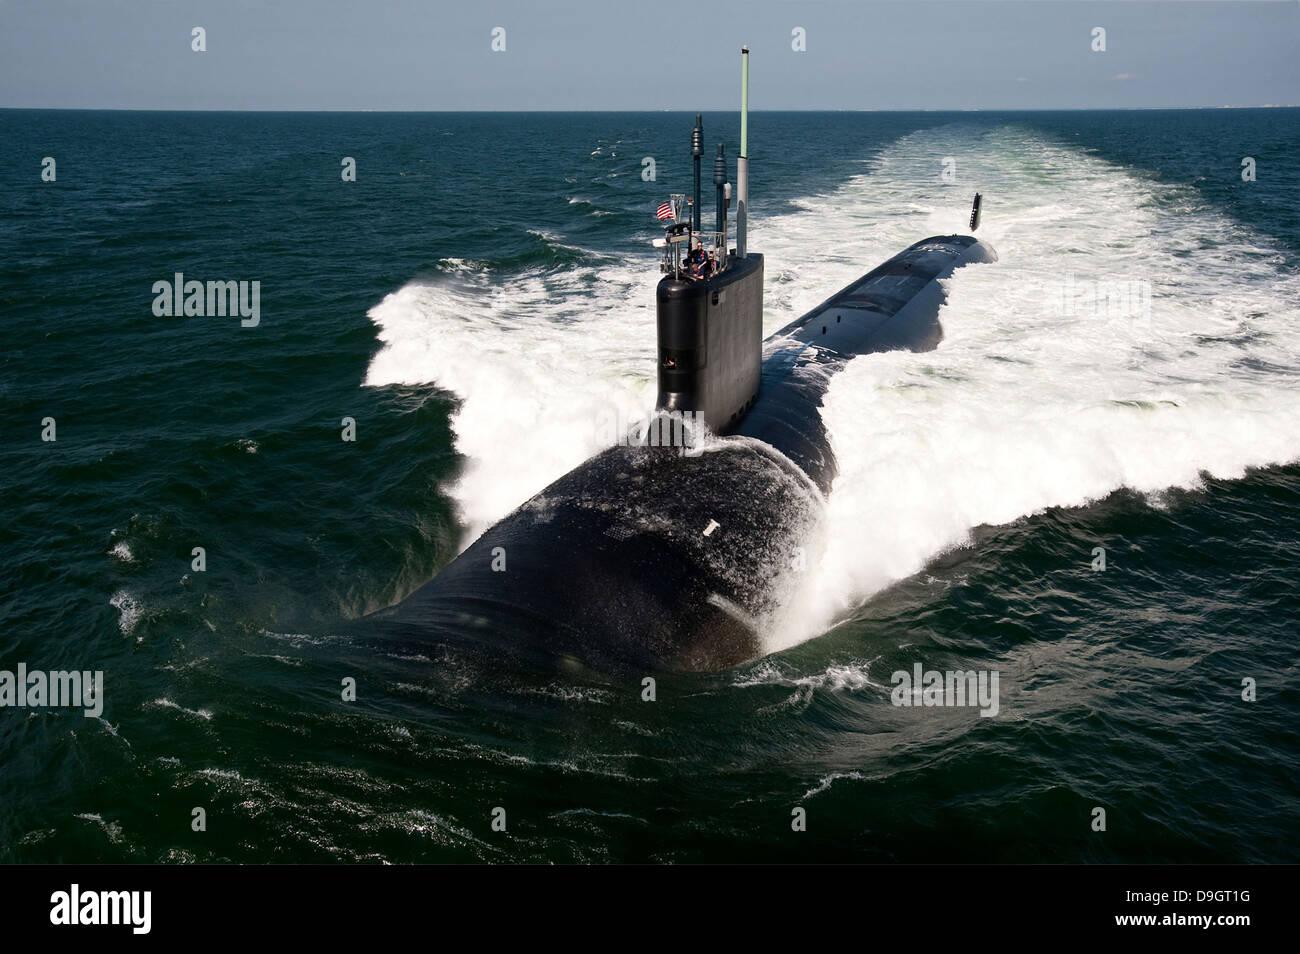 Océano Atlántico, 30 de junio de 2011 - El submarino de ataque de clase Virginia USS California (SSN 781) Imagen De Stock